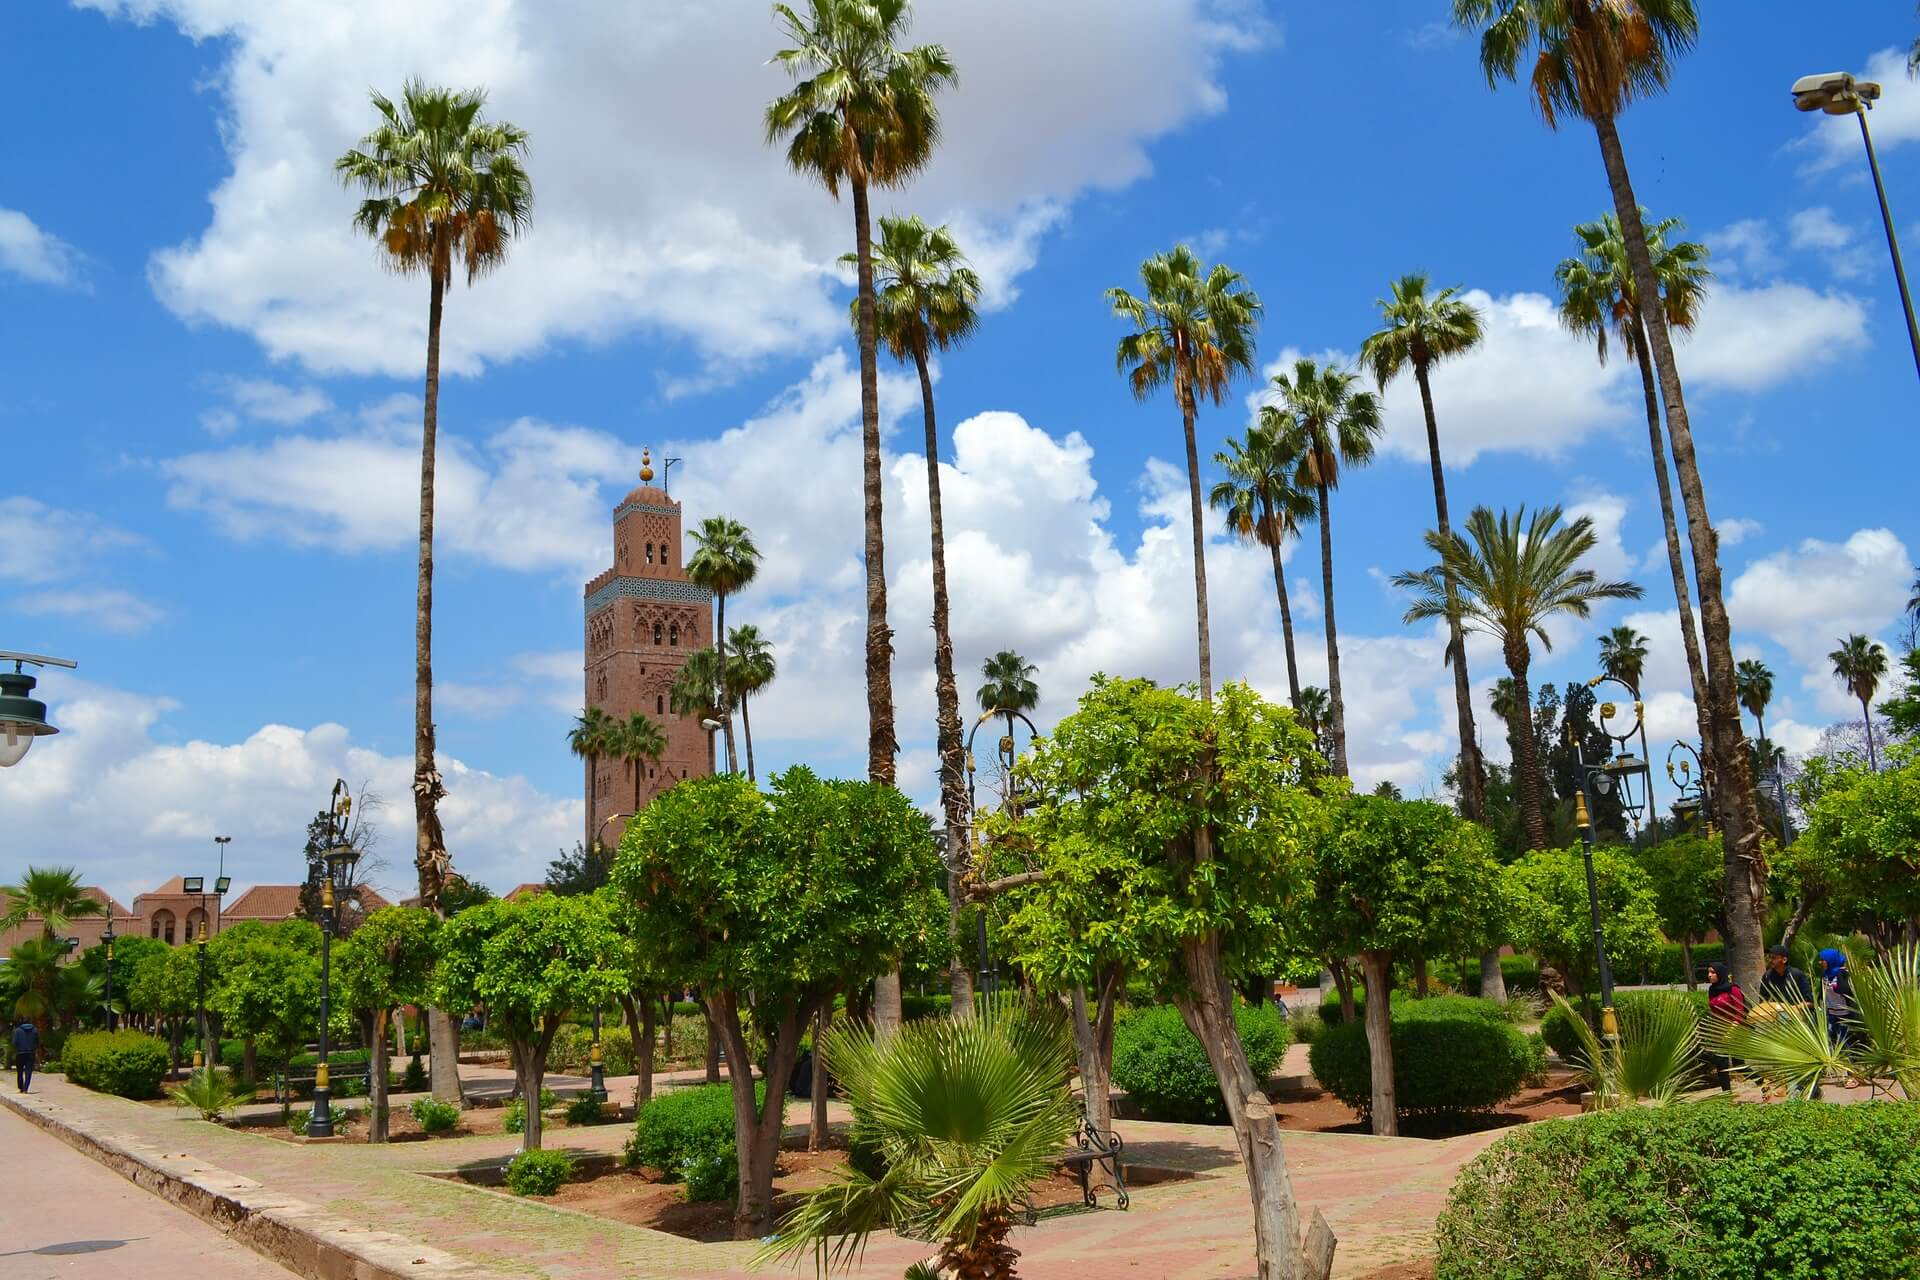 Jardin-Koutoubia - Visiter Marrakech concernant Jardin De La Koutoubia